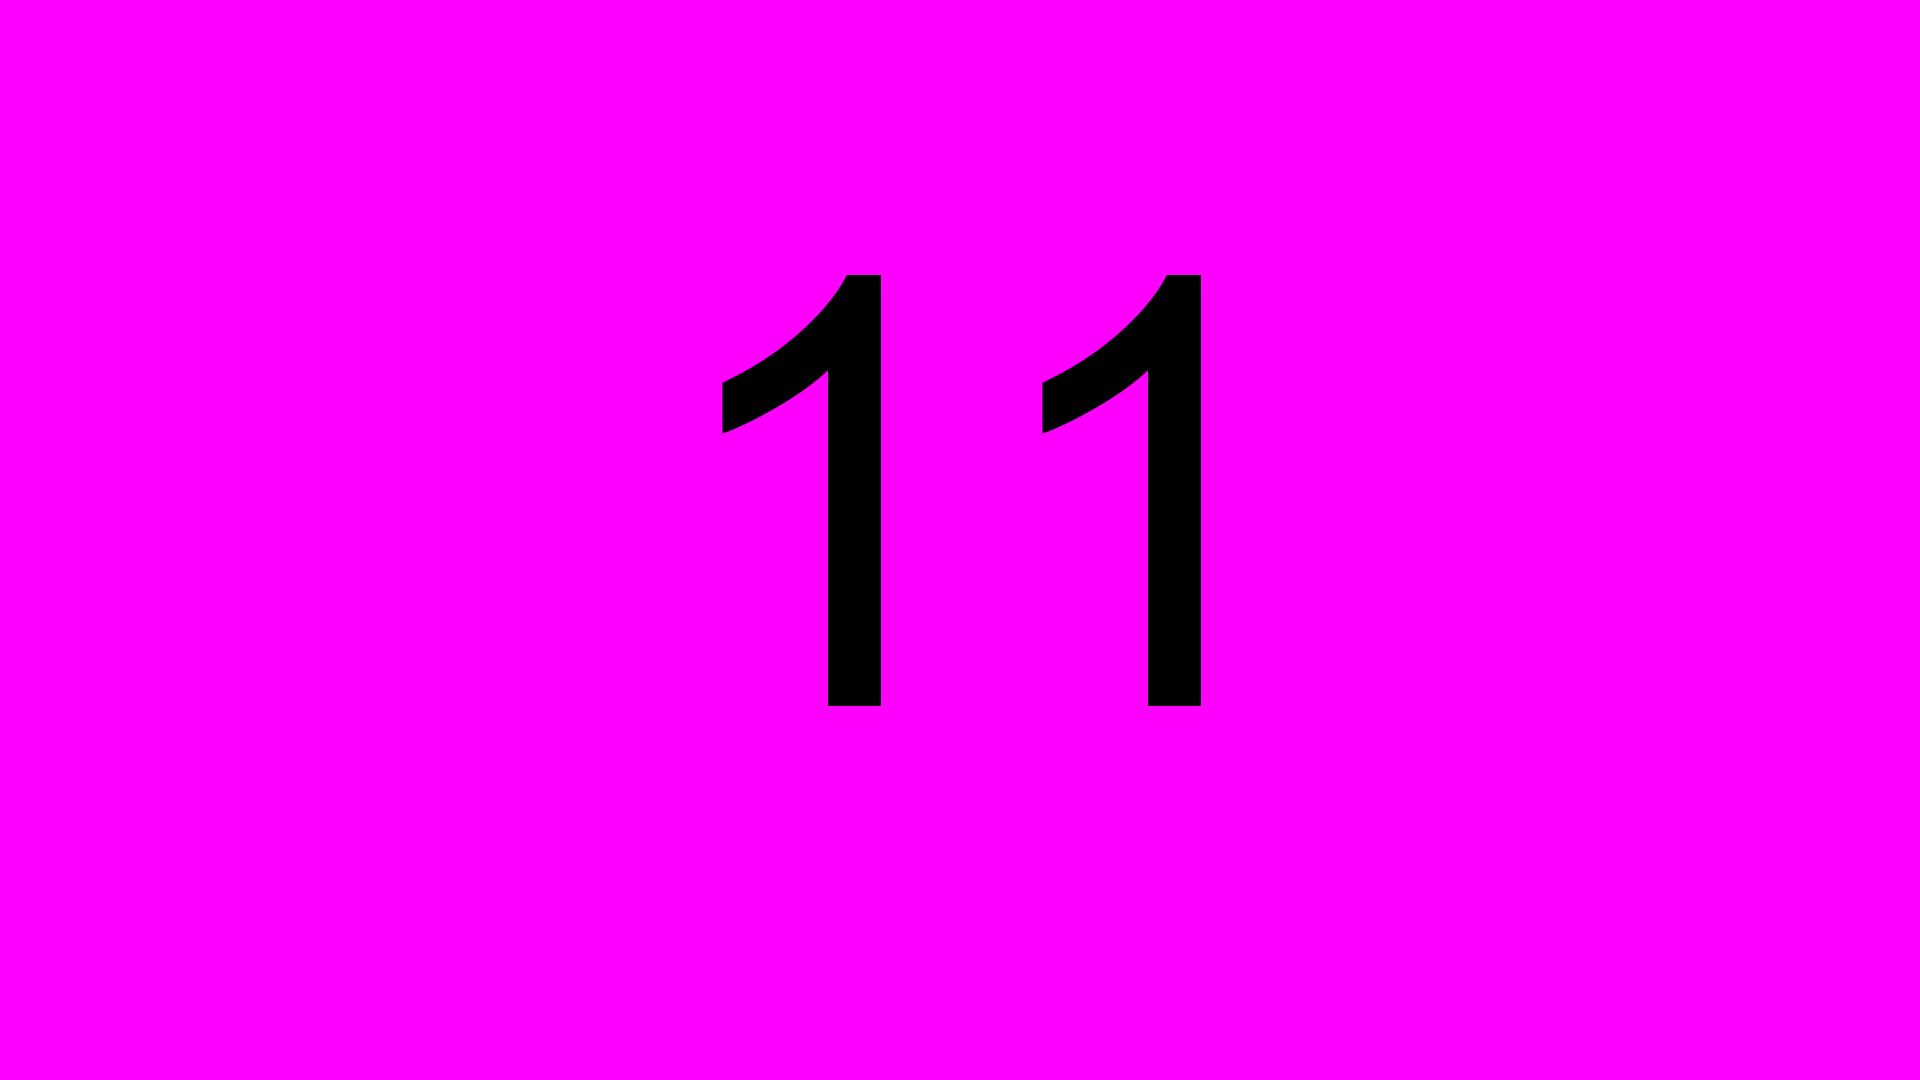 Magenta_11